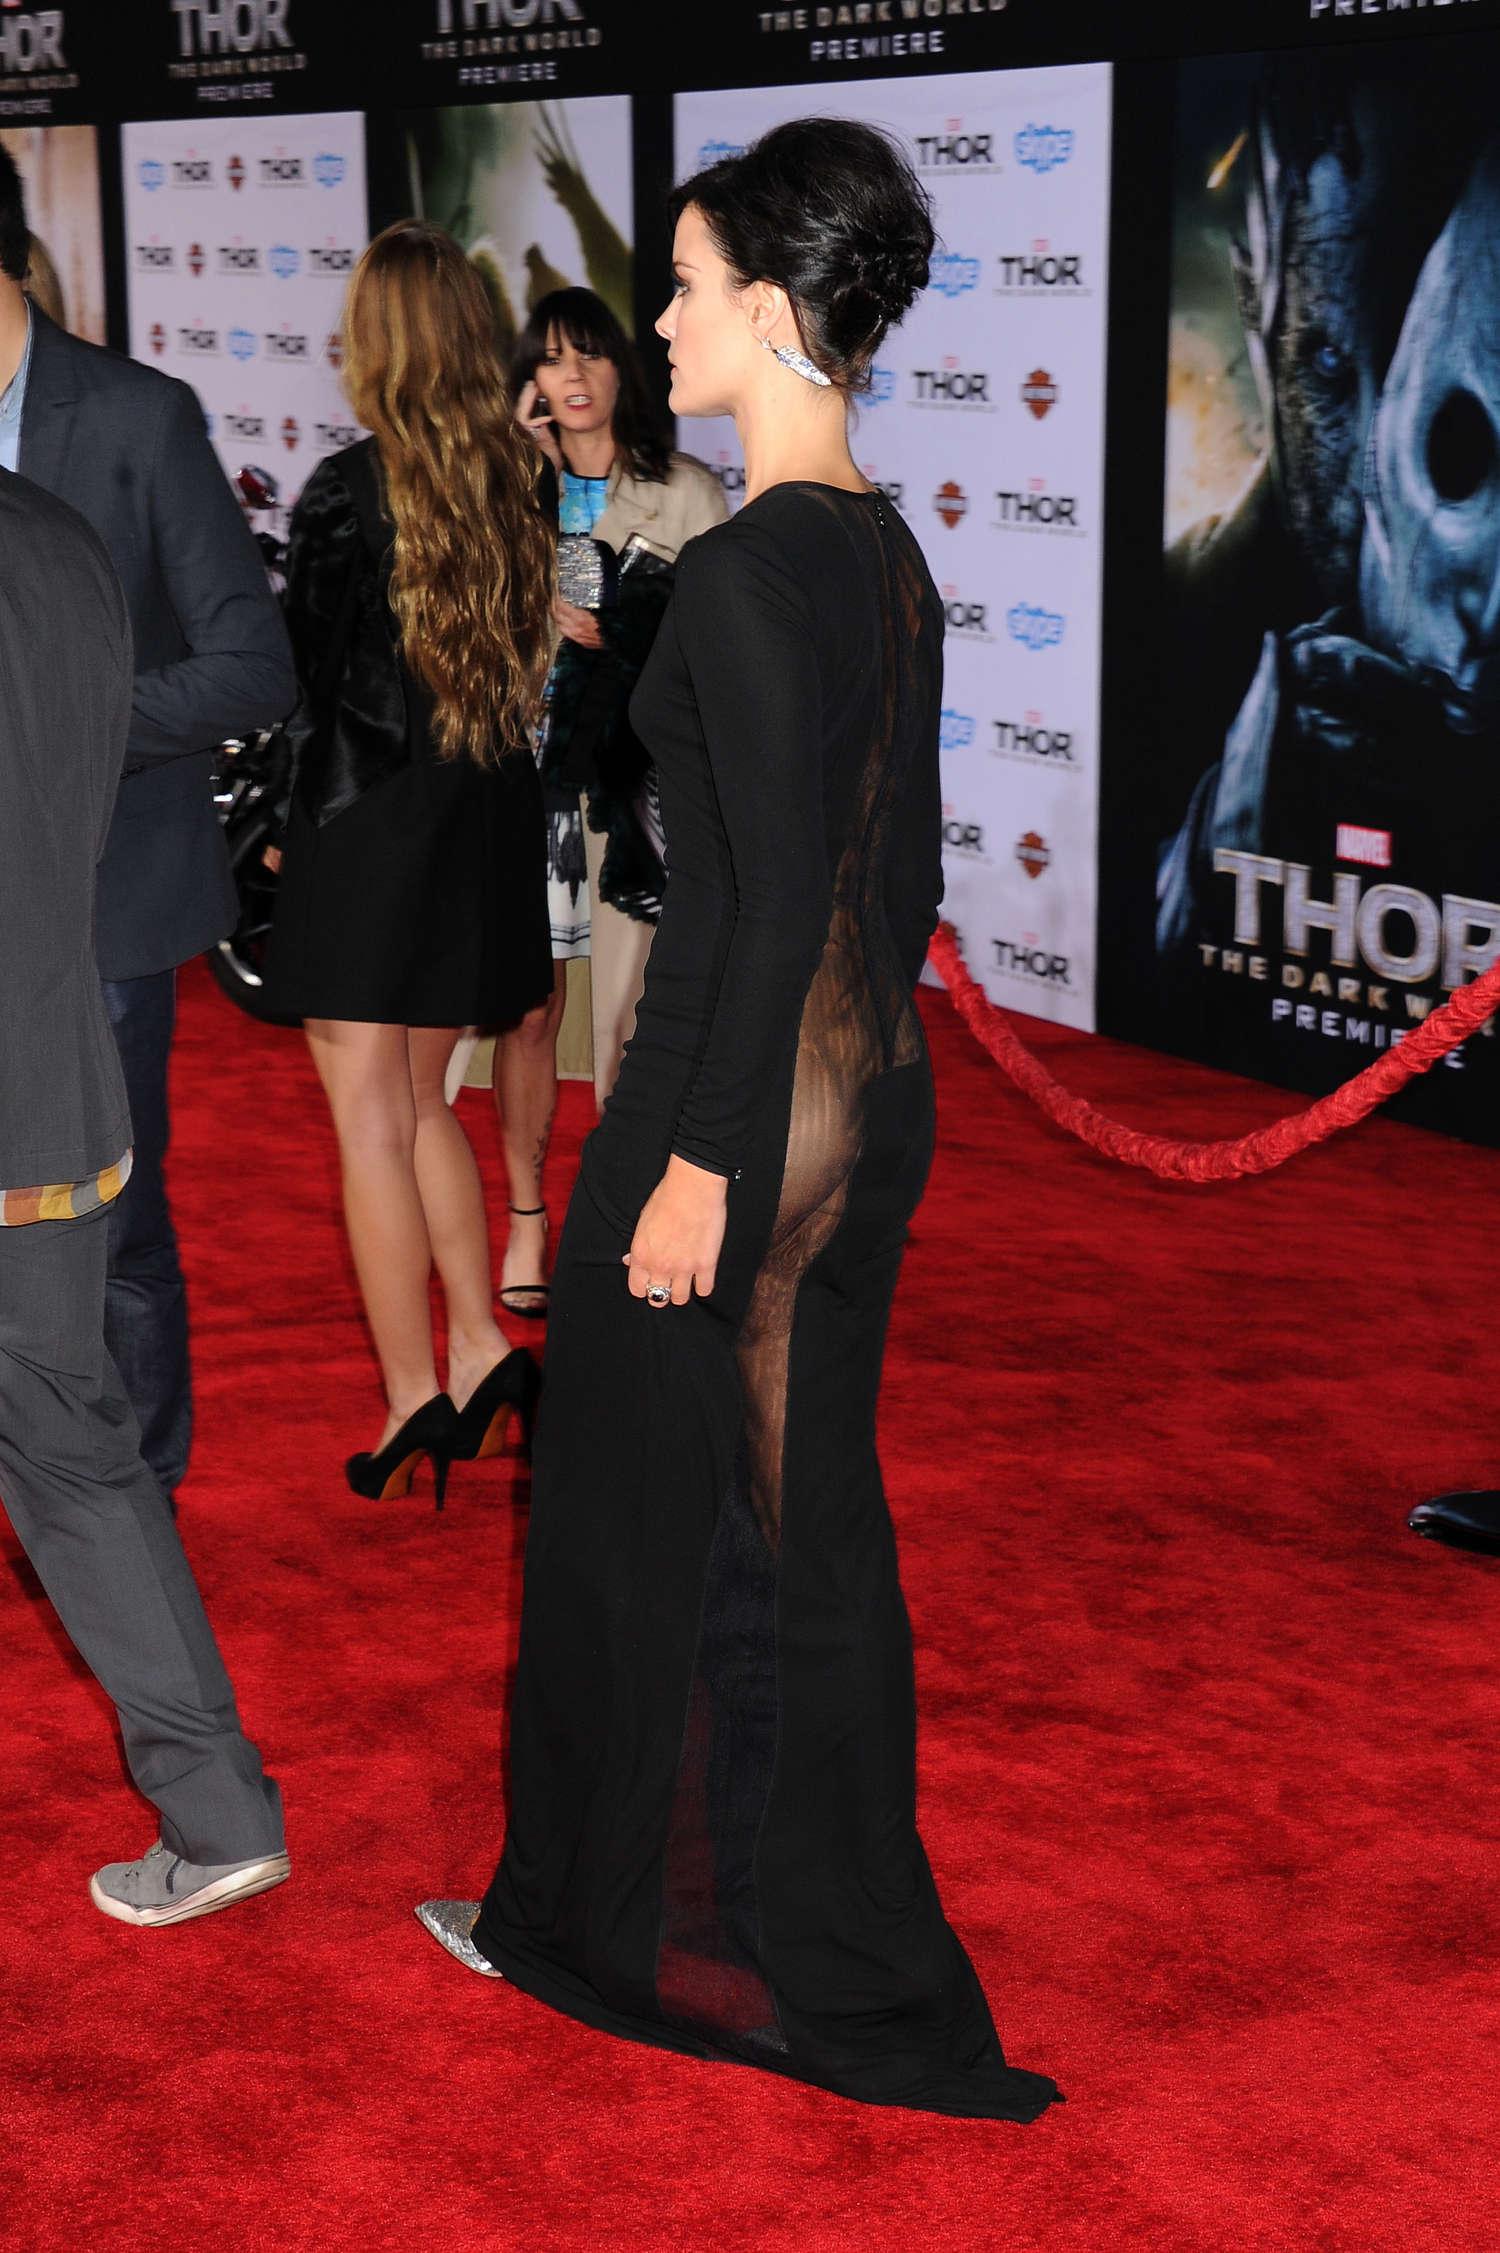 Jaimie Alexander Thor The Dark World Hollywood Premiere